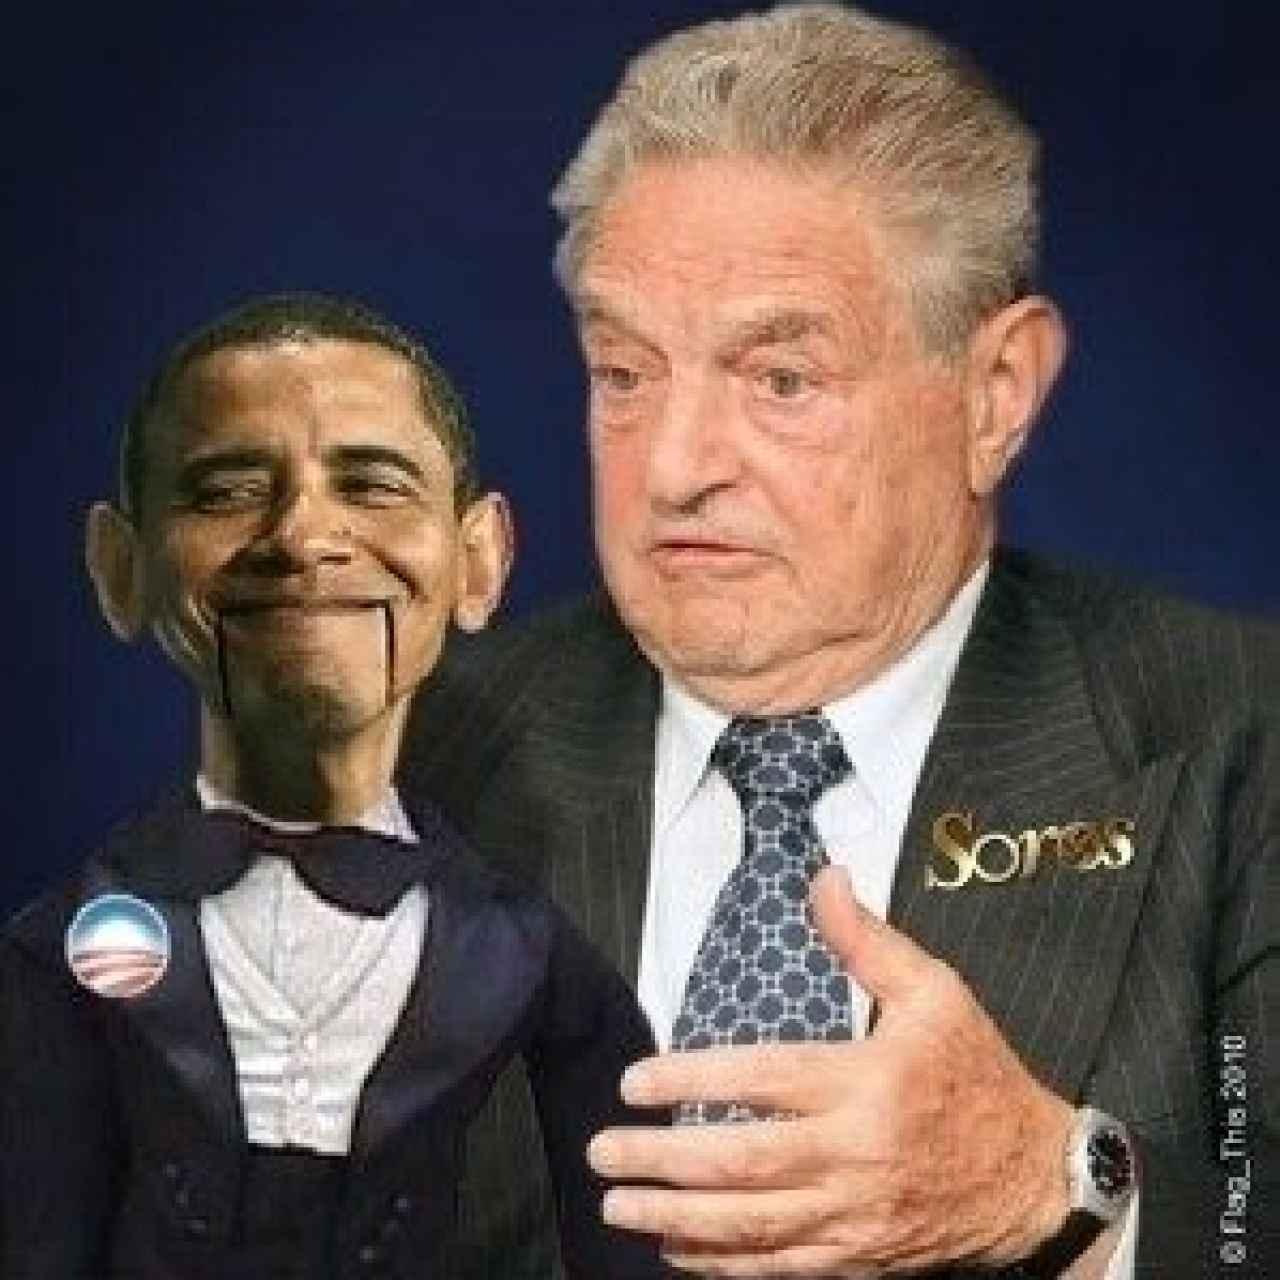 Meme que caricaturiza a Obama como una marioneta de Soros.